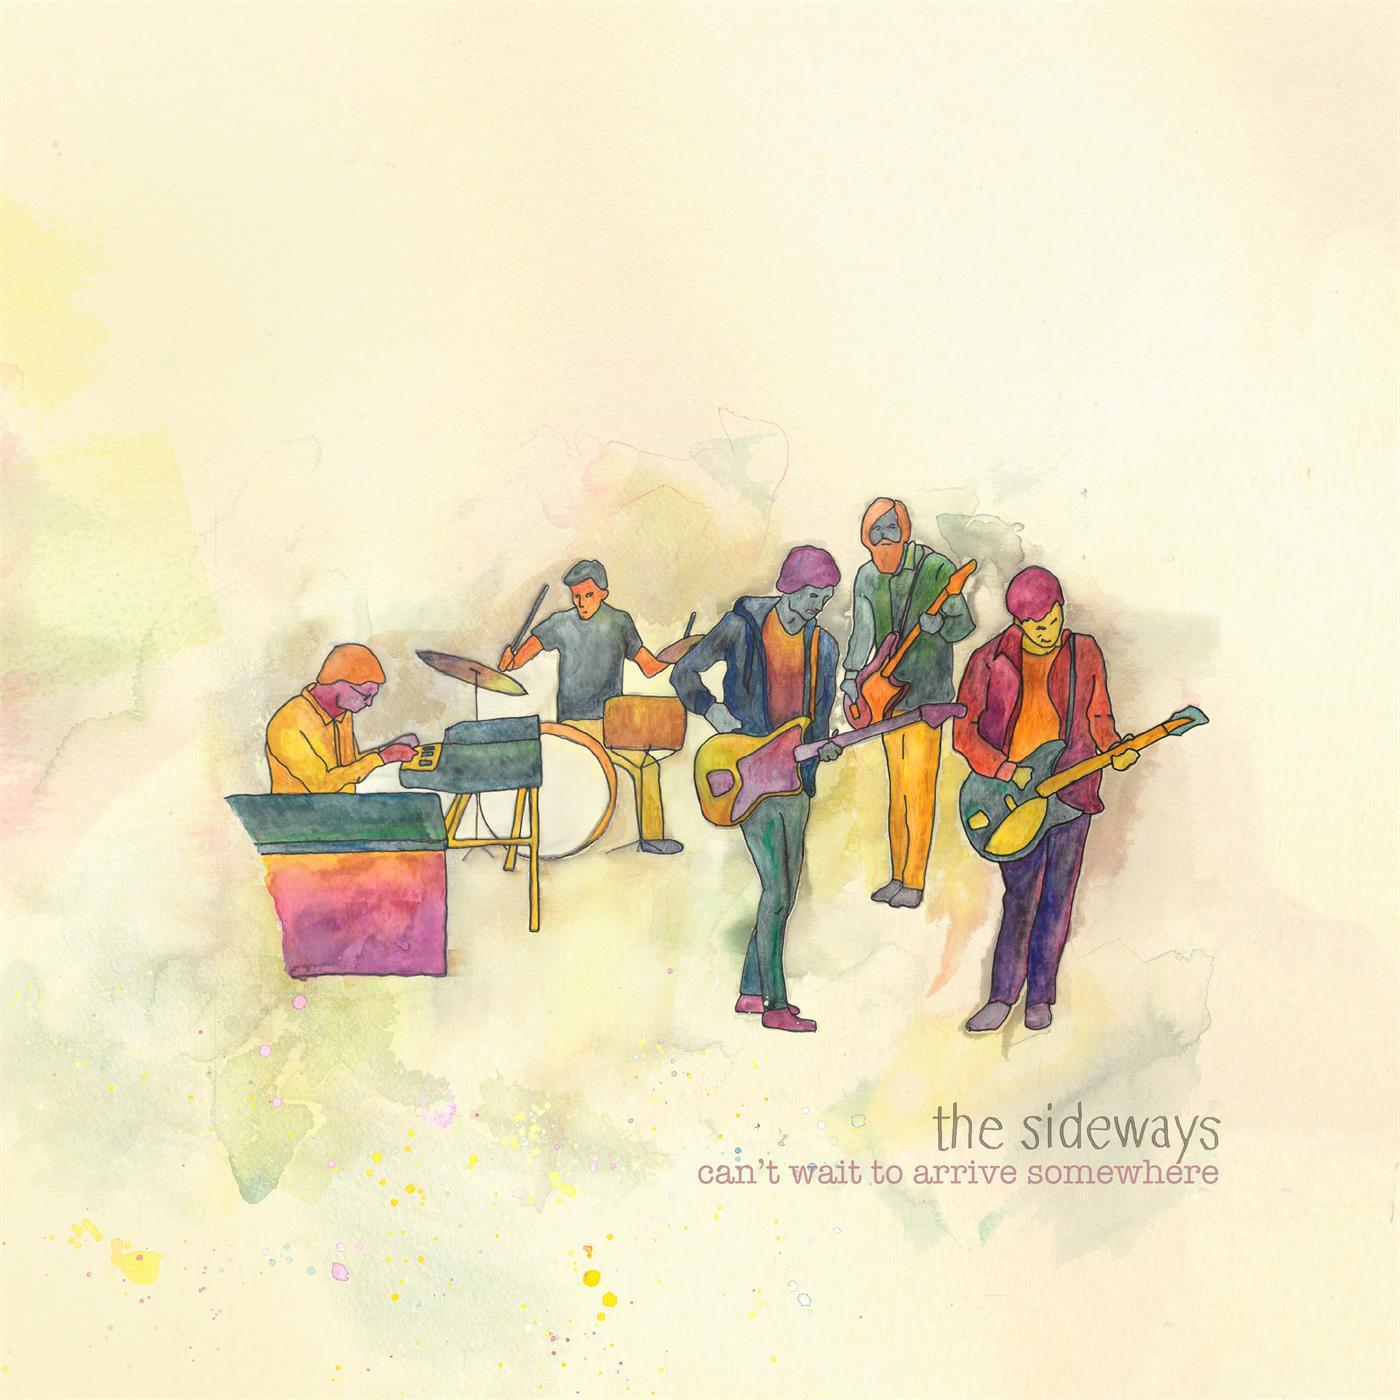 The Sideways - Can't Wait to Arrive Somewhere [LTD LP]